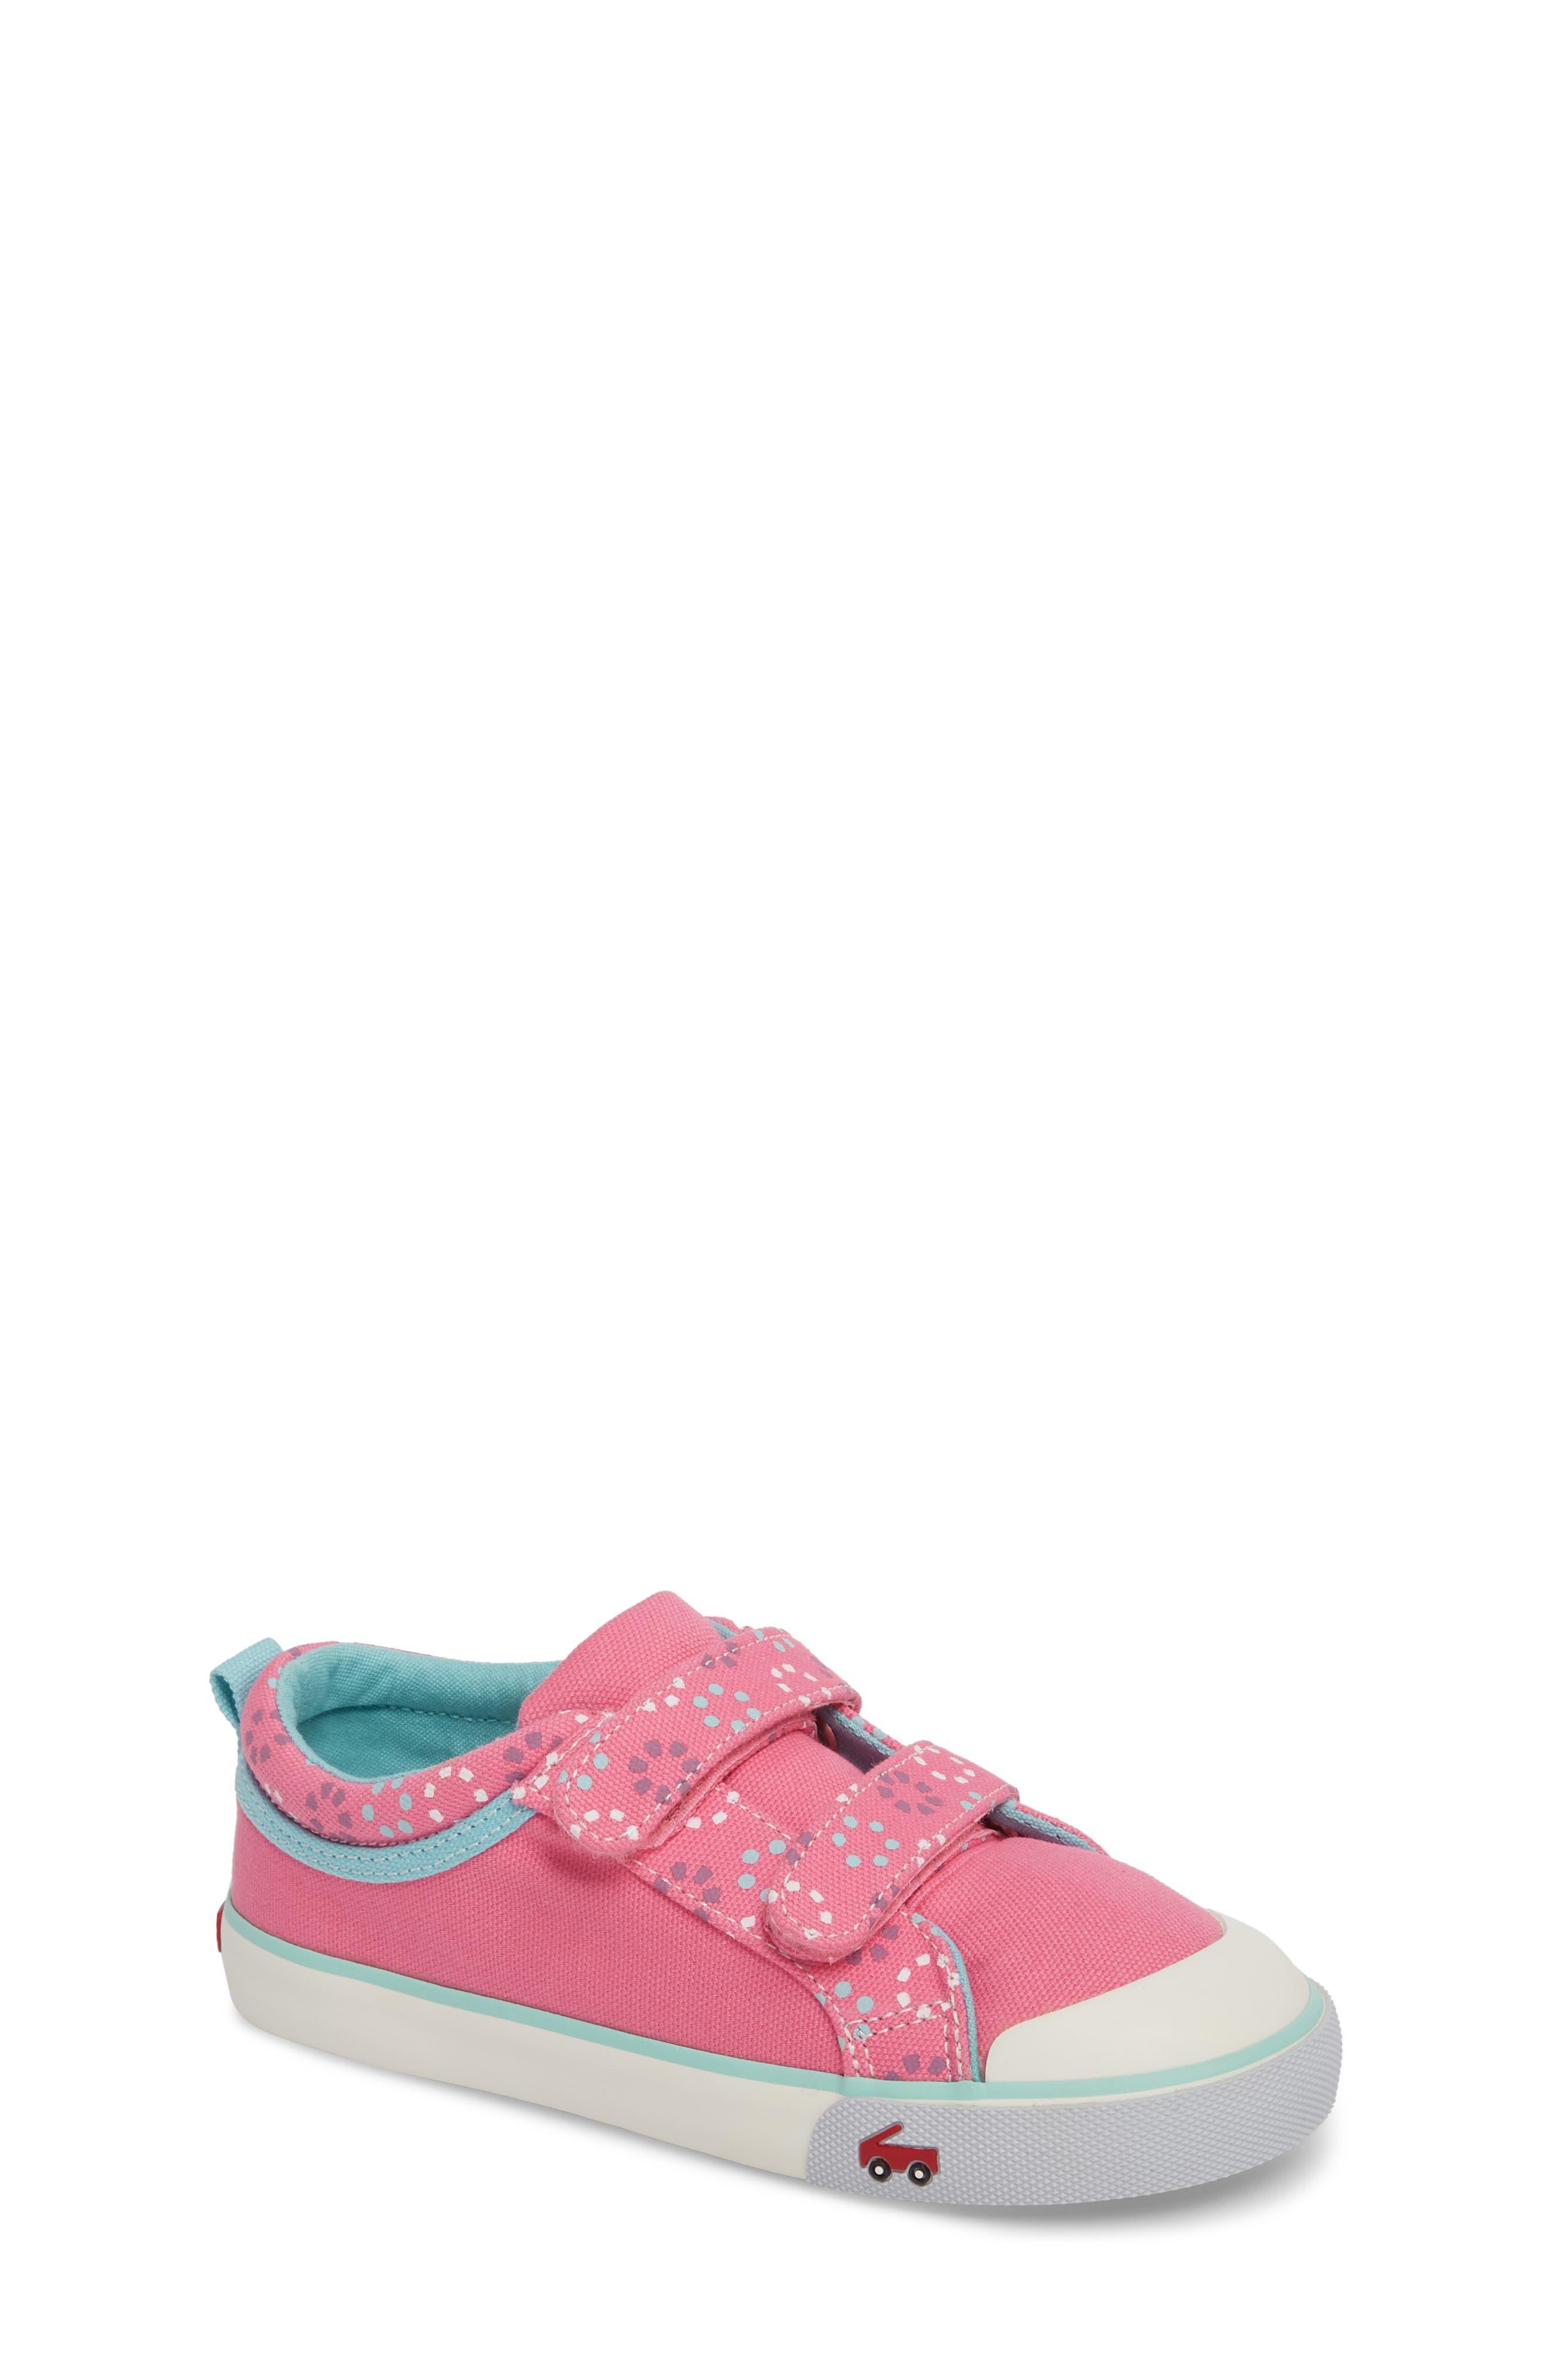 Alternate Image 1 Selected - See Kai Run 'Robyne' Sneaker (Baby, Walker & Toddler)